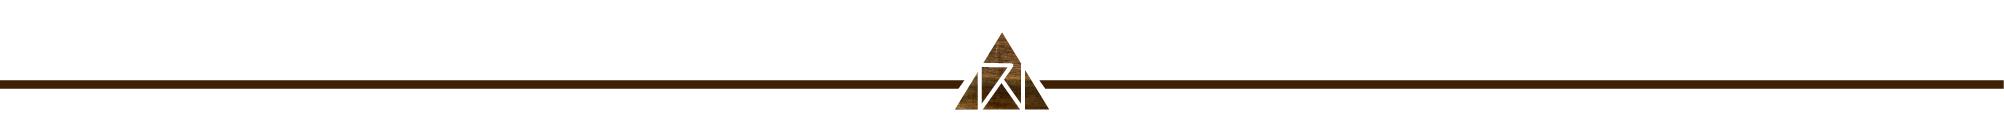 Dan-Wootton-Lines_Brown-Wooden.jpg